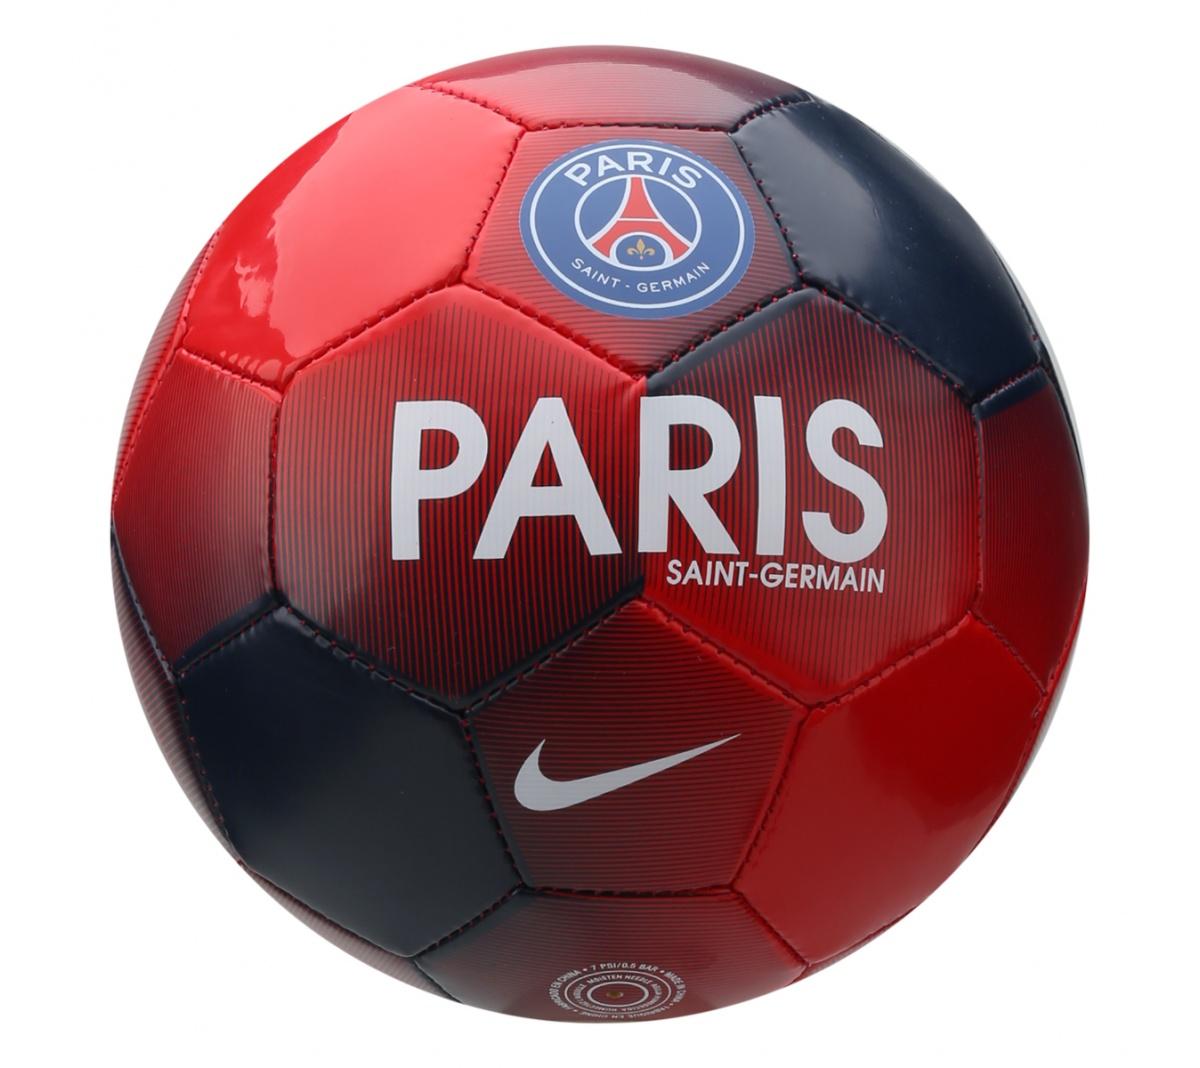 Mini Bola Paris Saint Germain Skills - Mundo do Futebol b69c70c4c3f3f